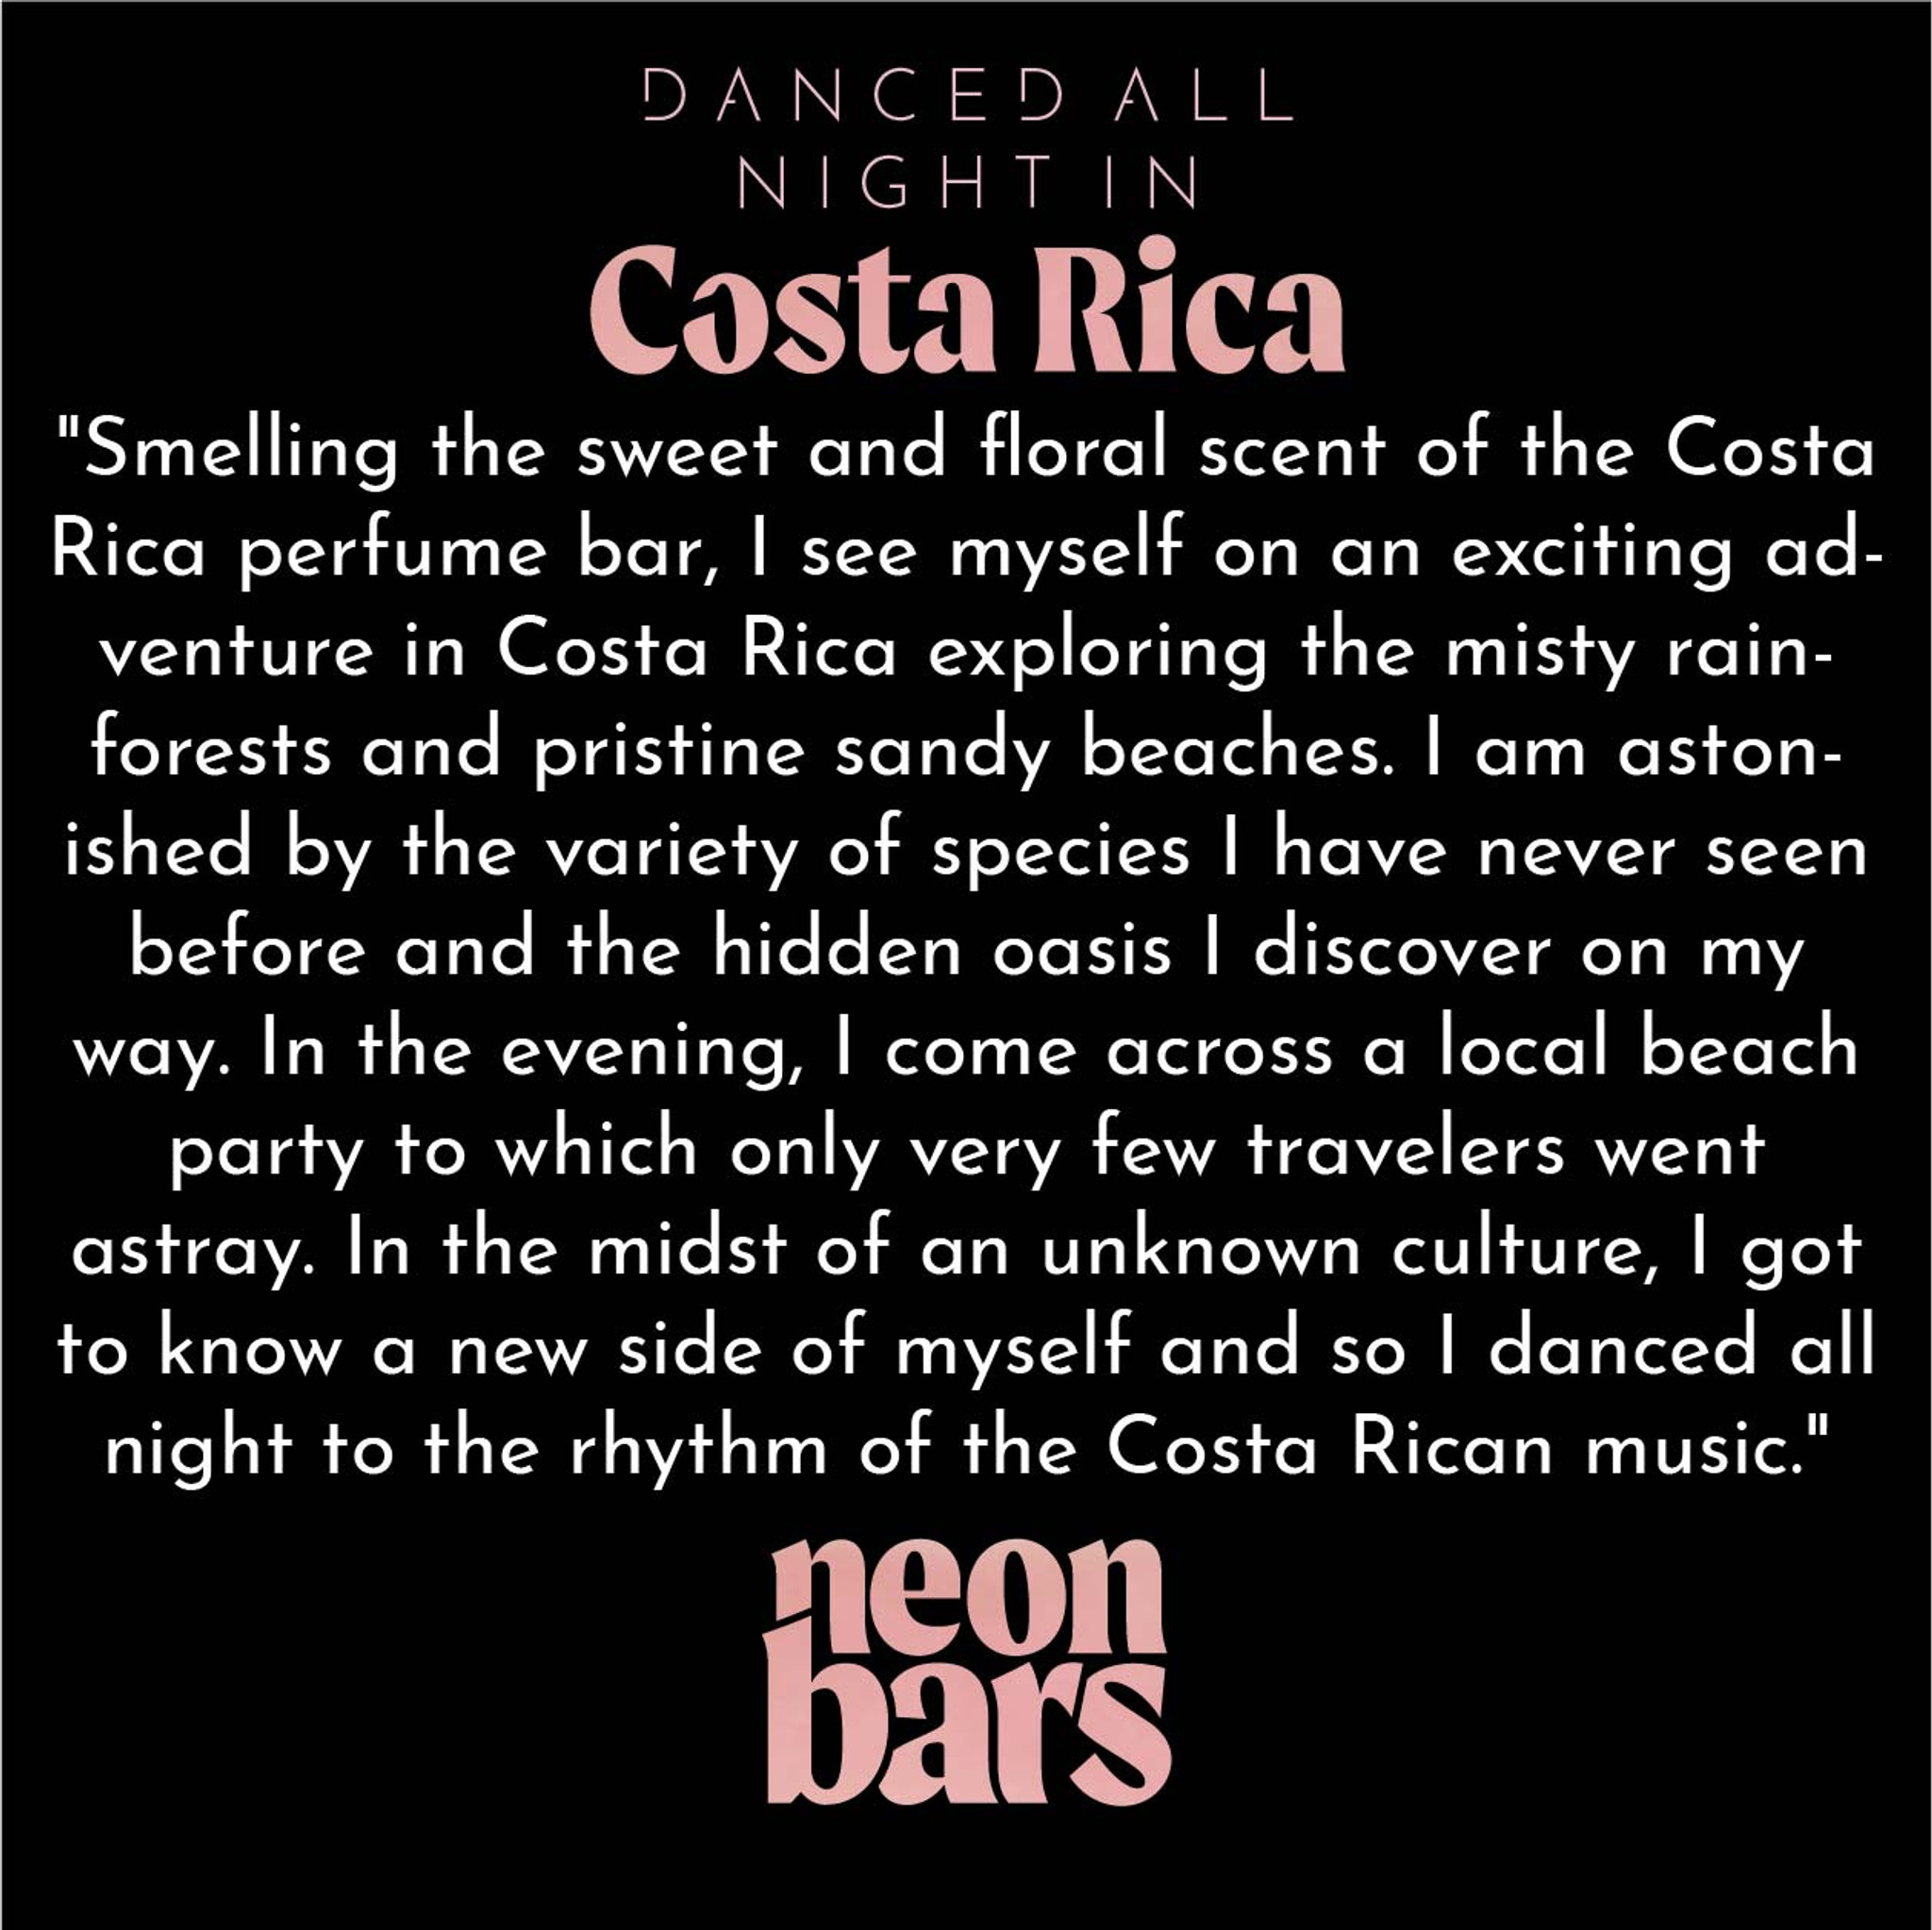 danced all night in Costa Rica